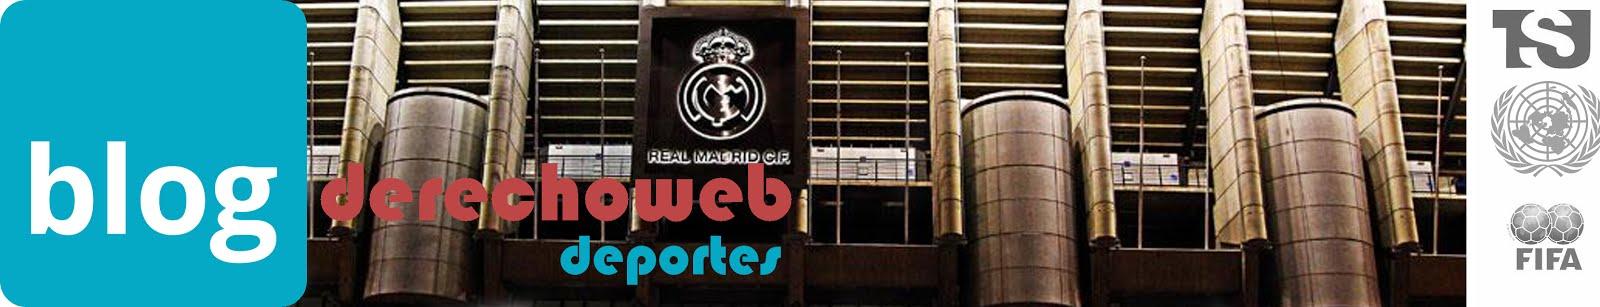 DerechoWeb Futbol